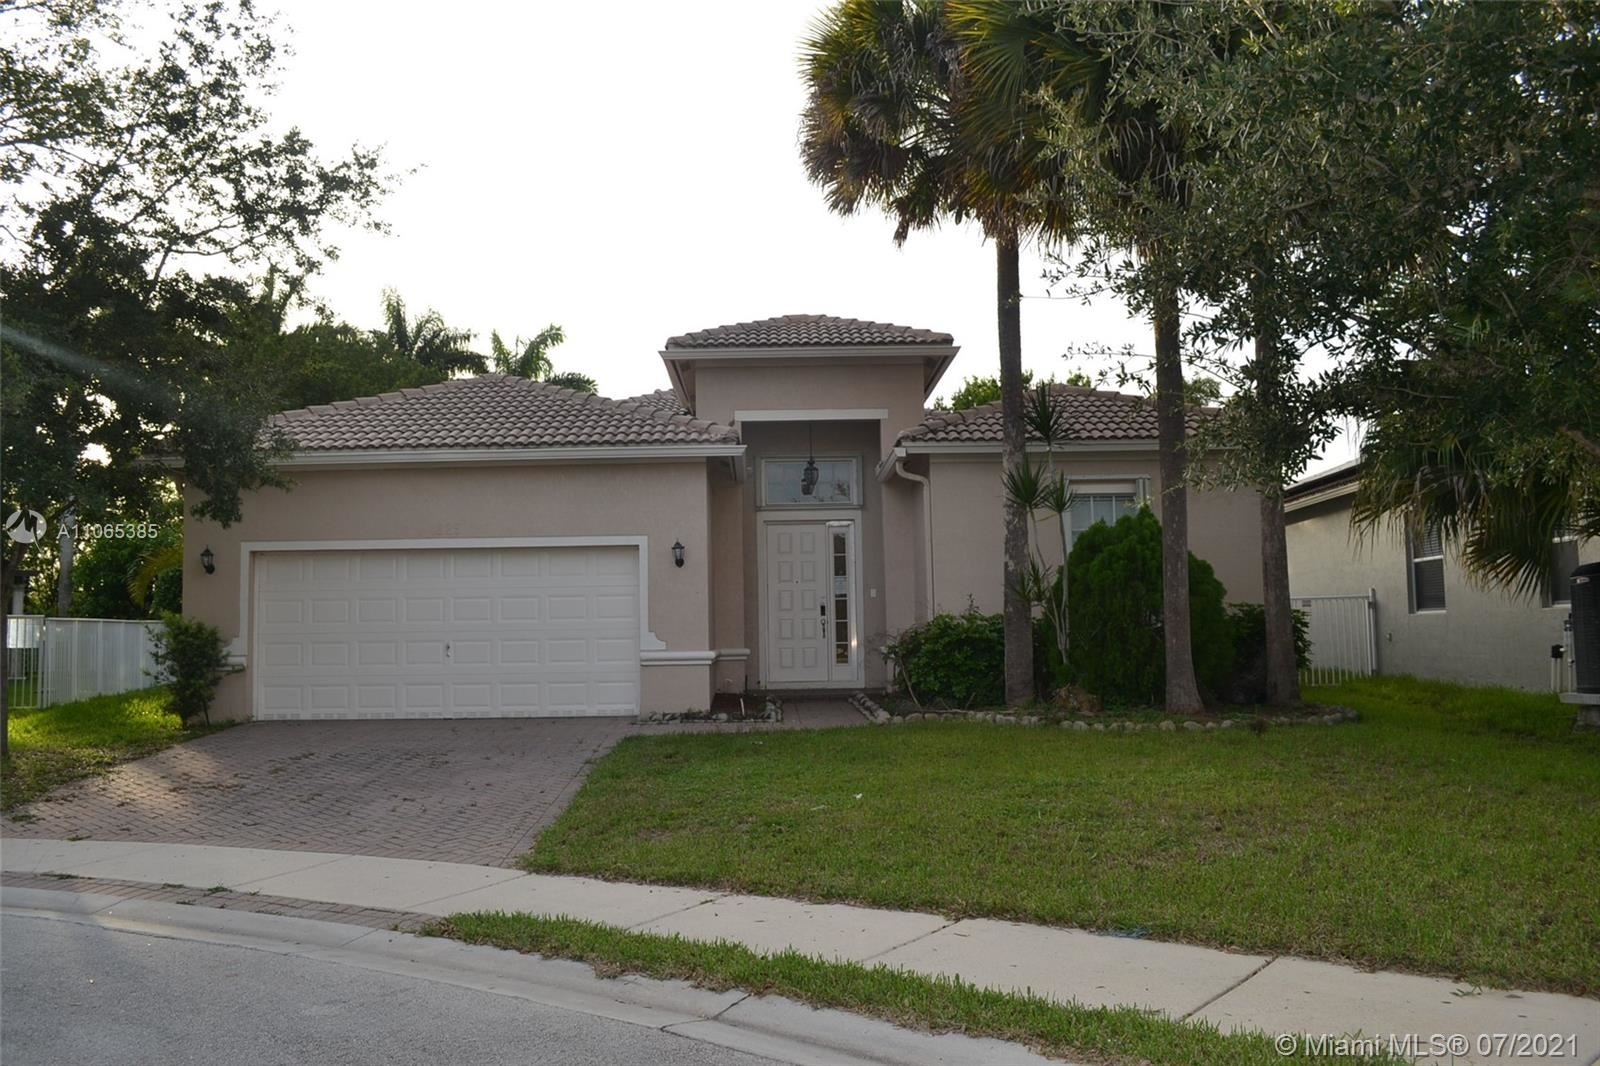 4325 W Whitewater Ave, Weston, FL 33332 - #: A11065385